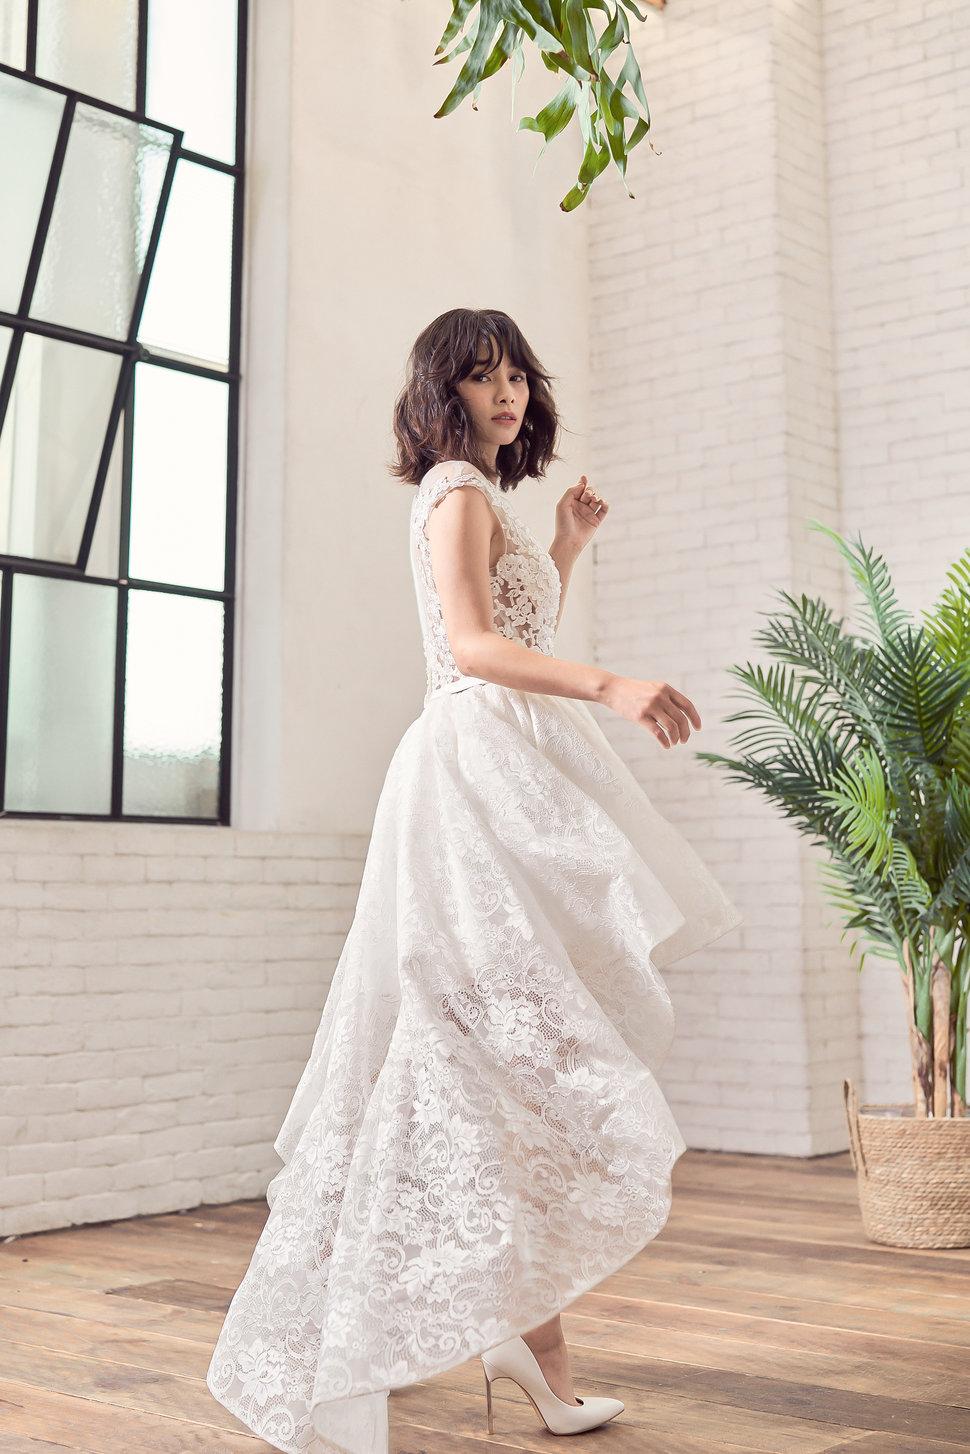 190731_0225 - Mikeshi wedding 米娔詩手《結婚吧》